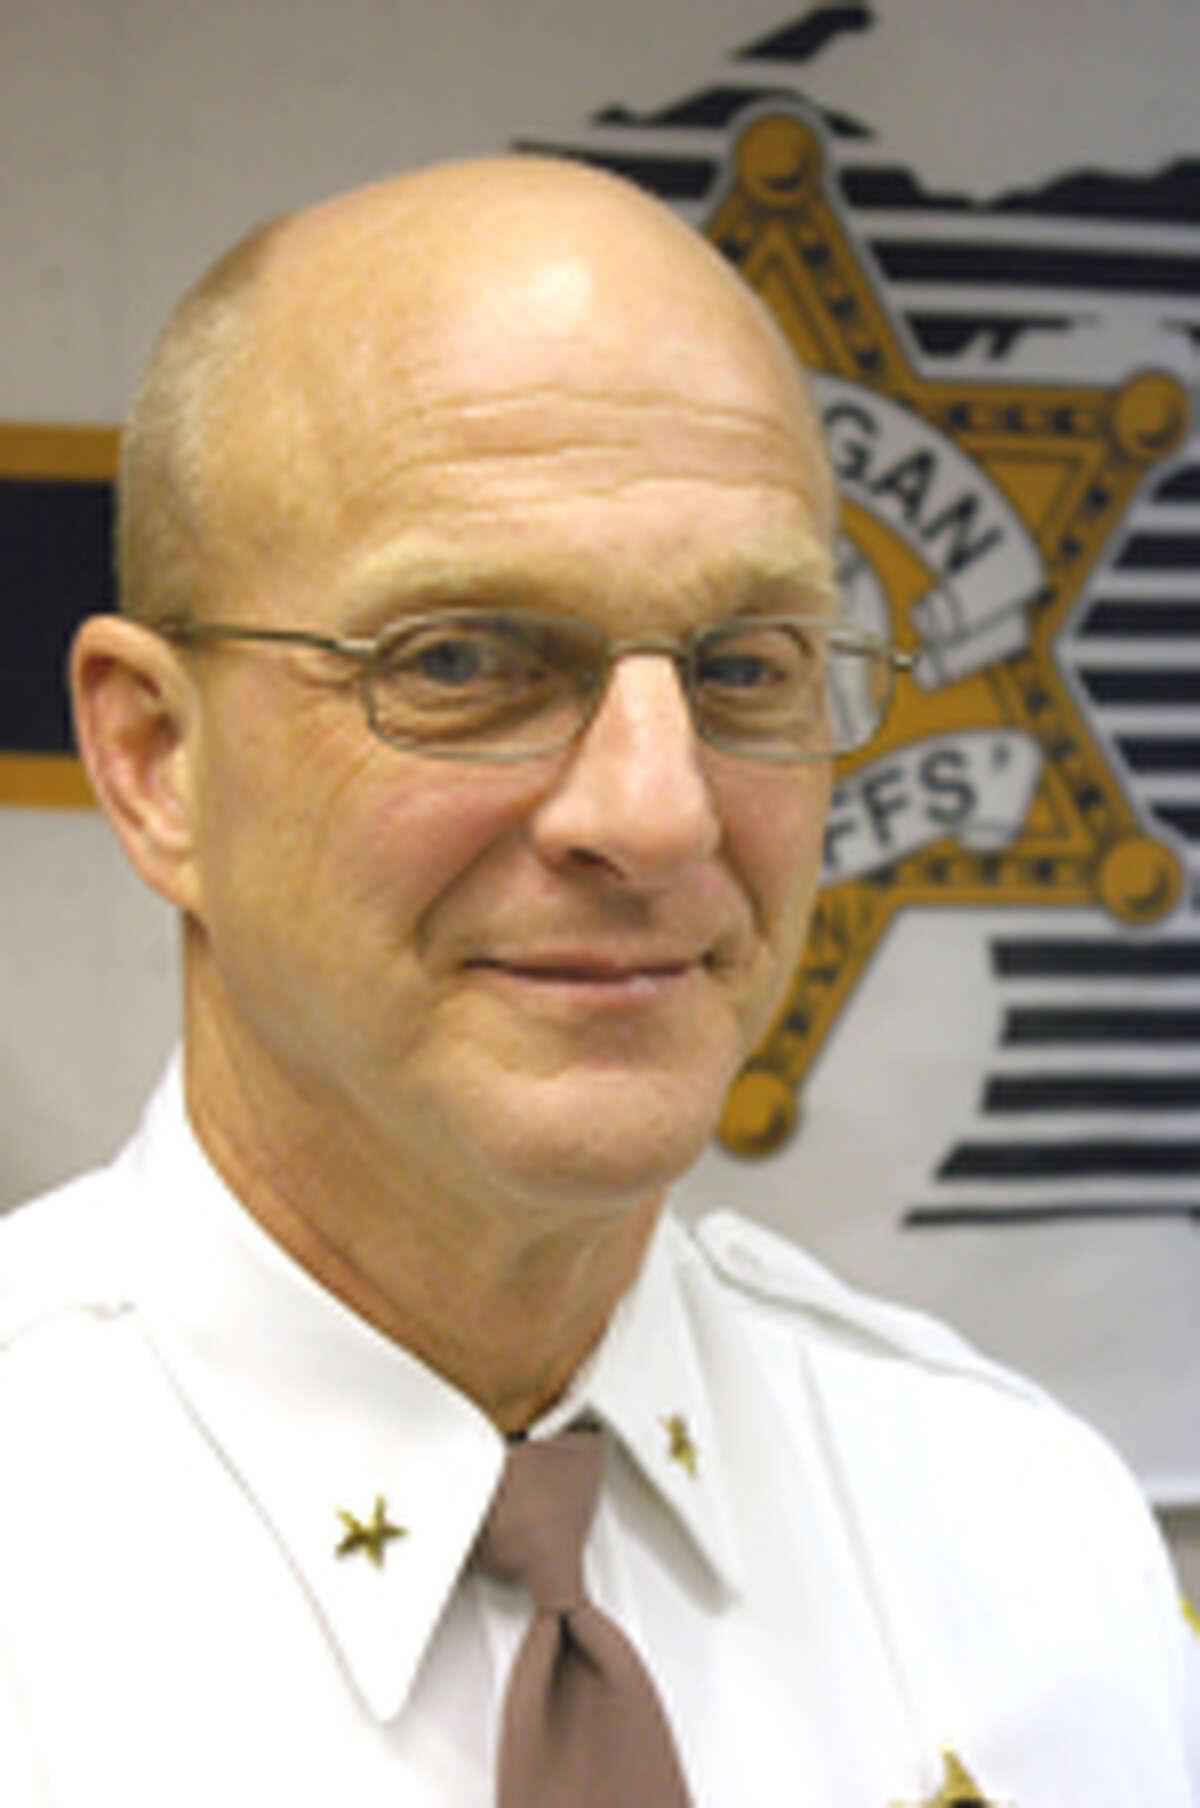 Manistee County sheriff Dale Kowalkowski